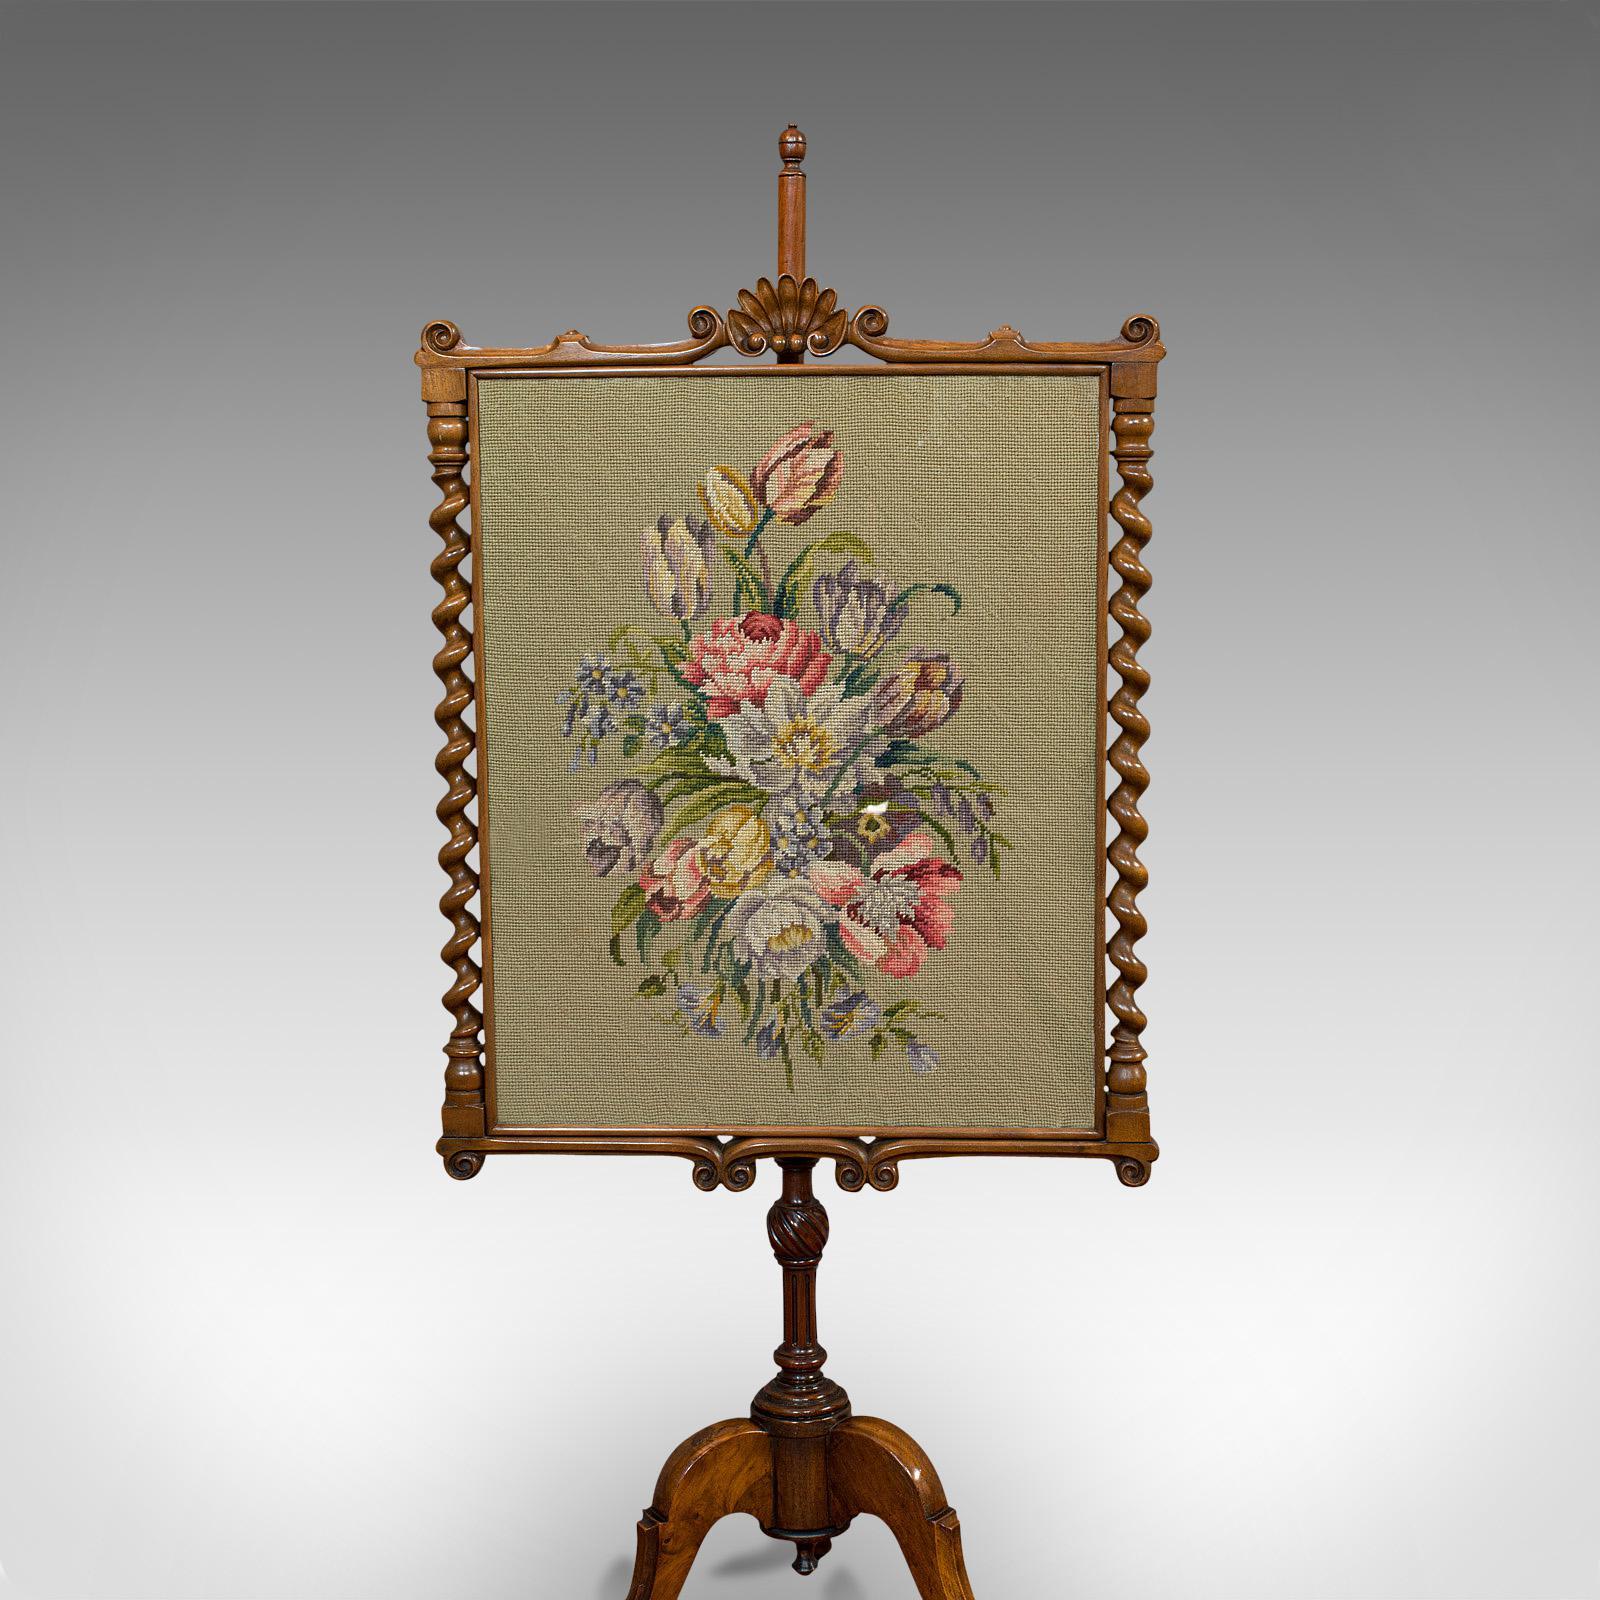 Antique Adjustable Fire Screen Walnut Needlepoint Decorative Pole Regency 18 7030 La329098 Loveantiques Com